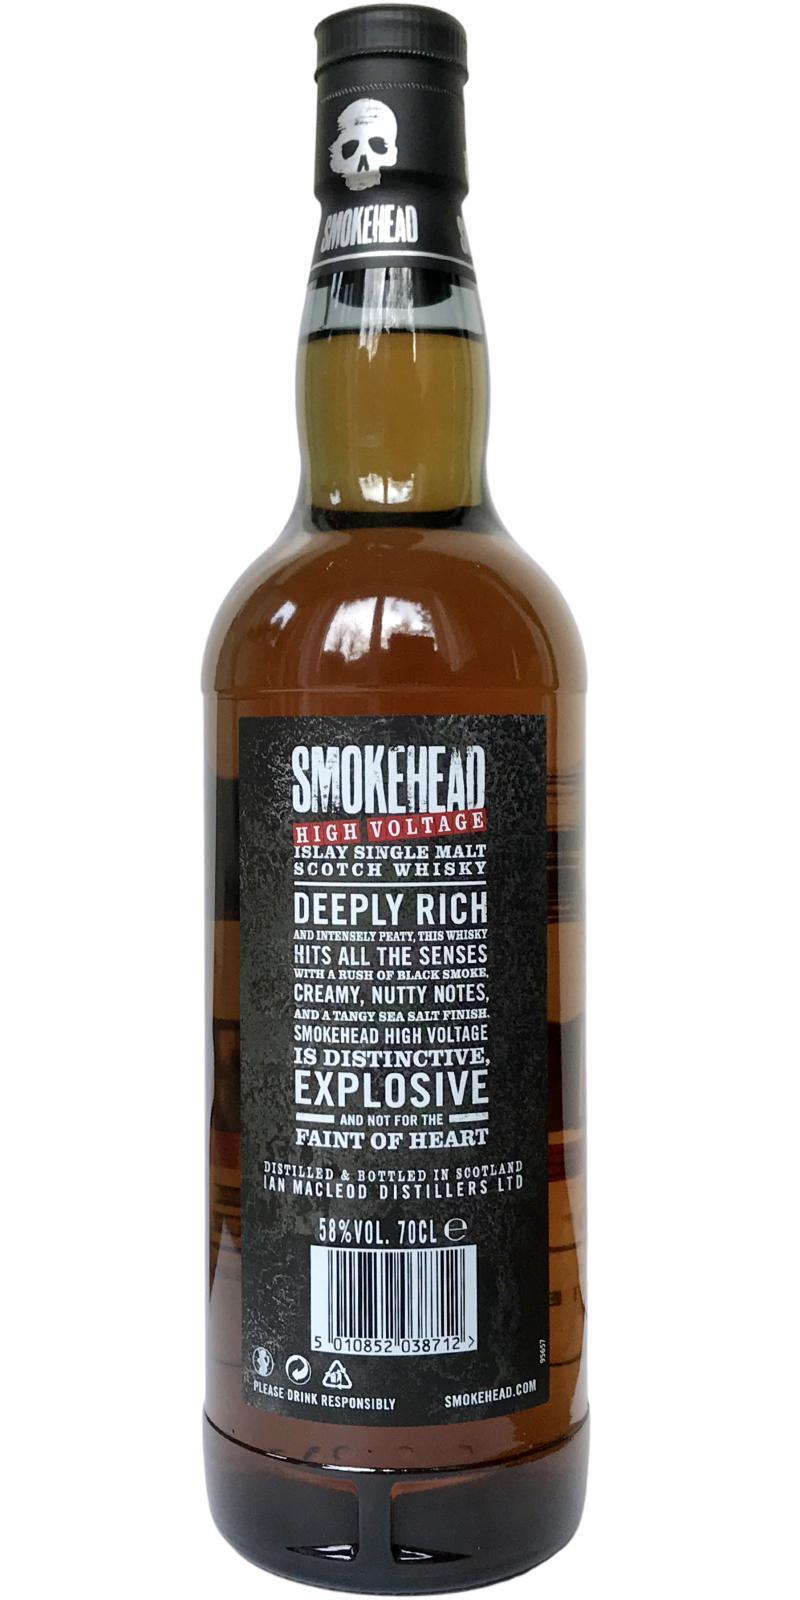 Smokehead High Voltage IM